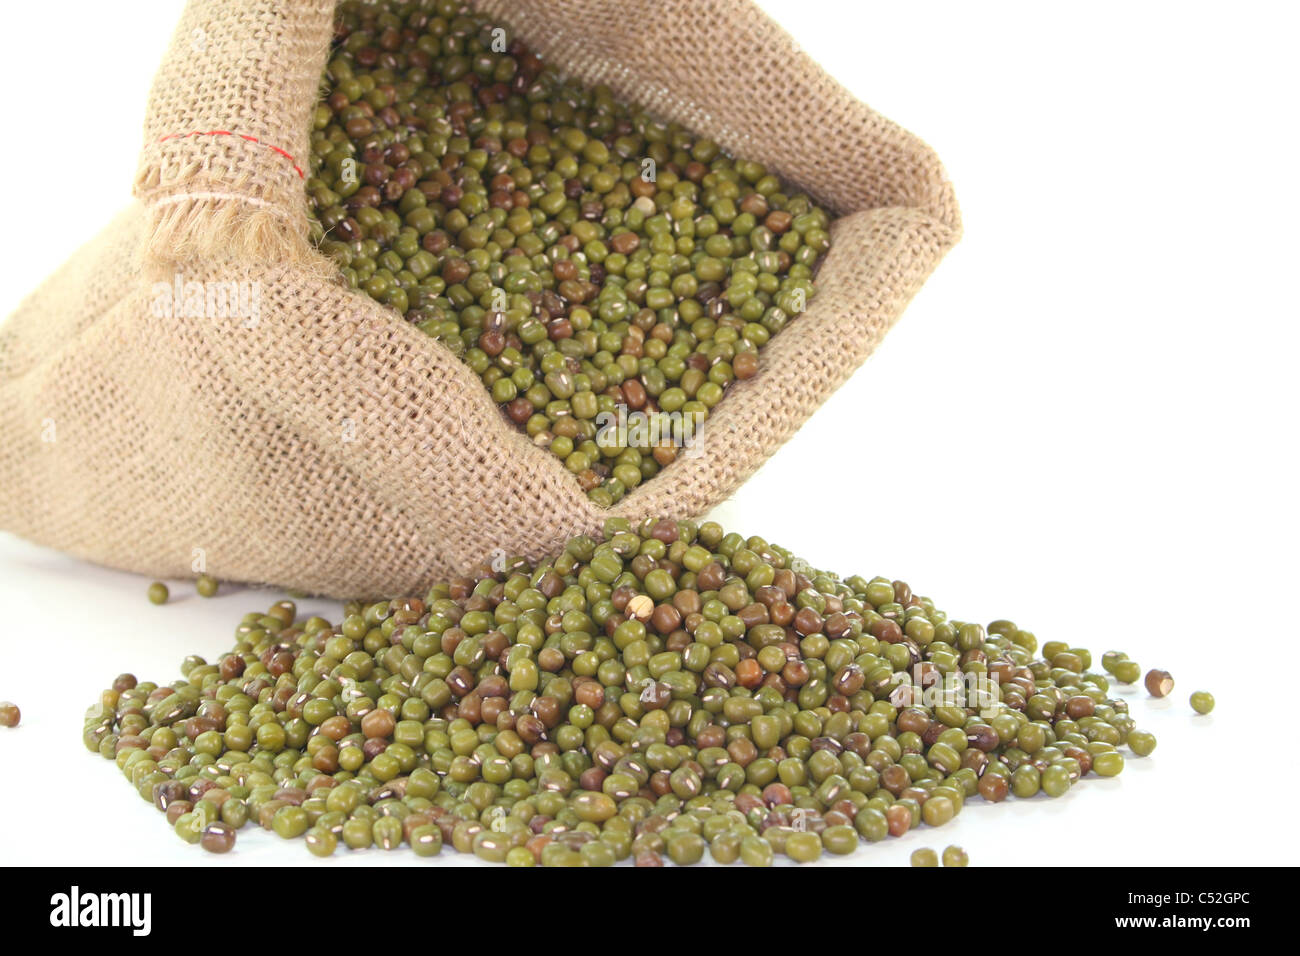 a sack of mungo beans on white background - Stock Image